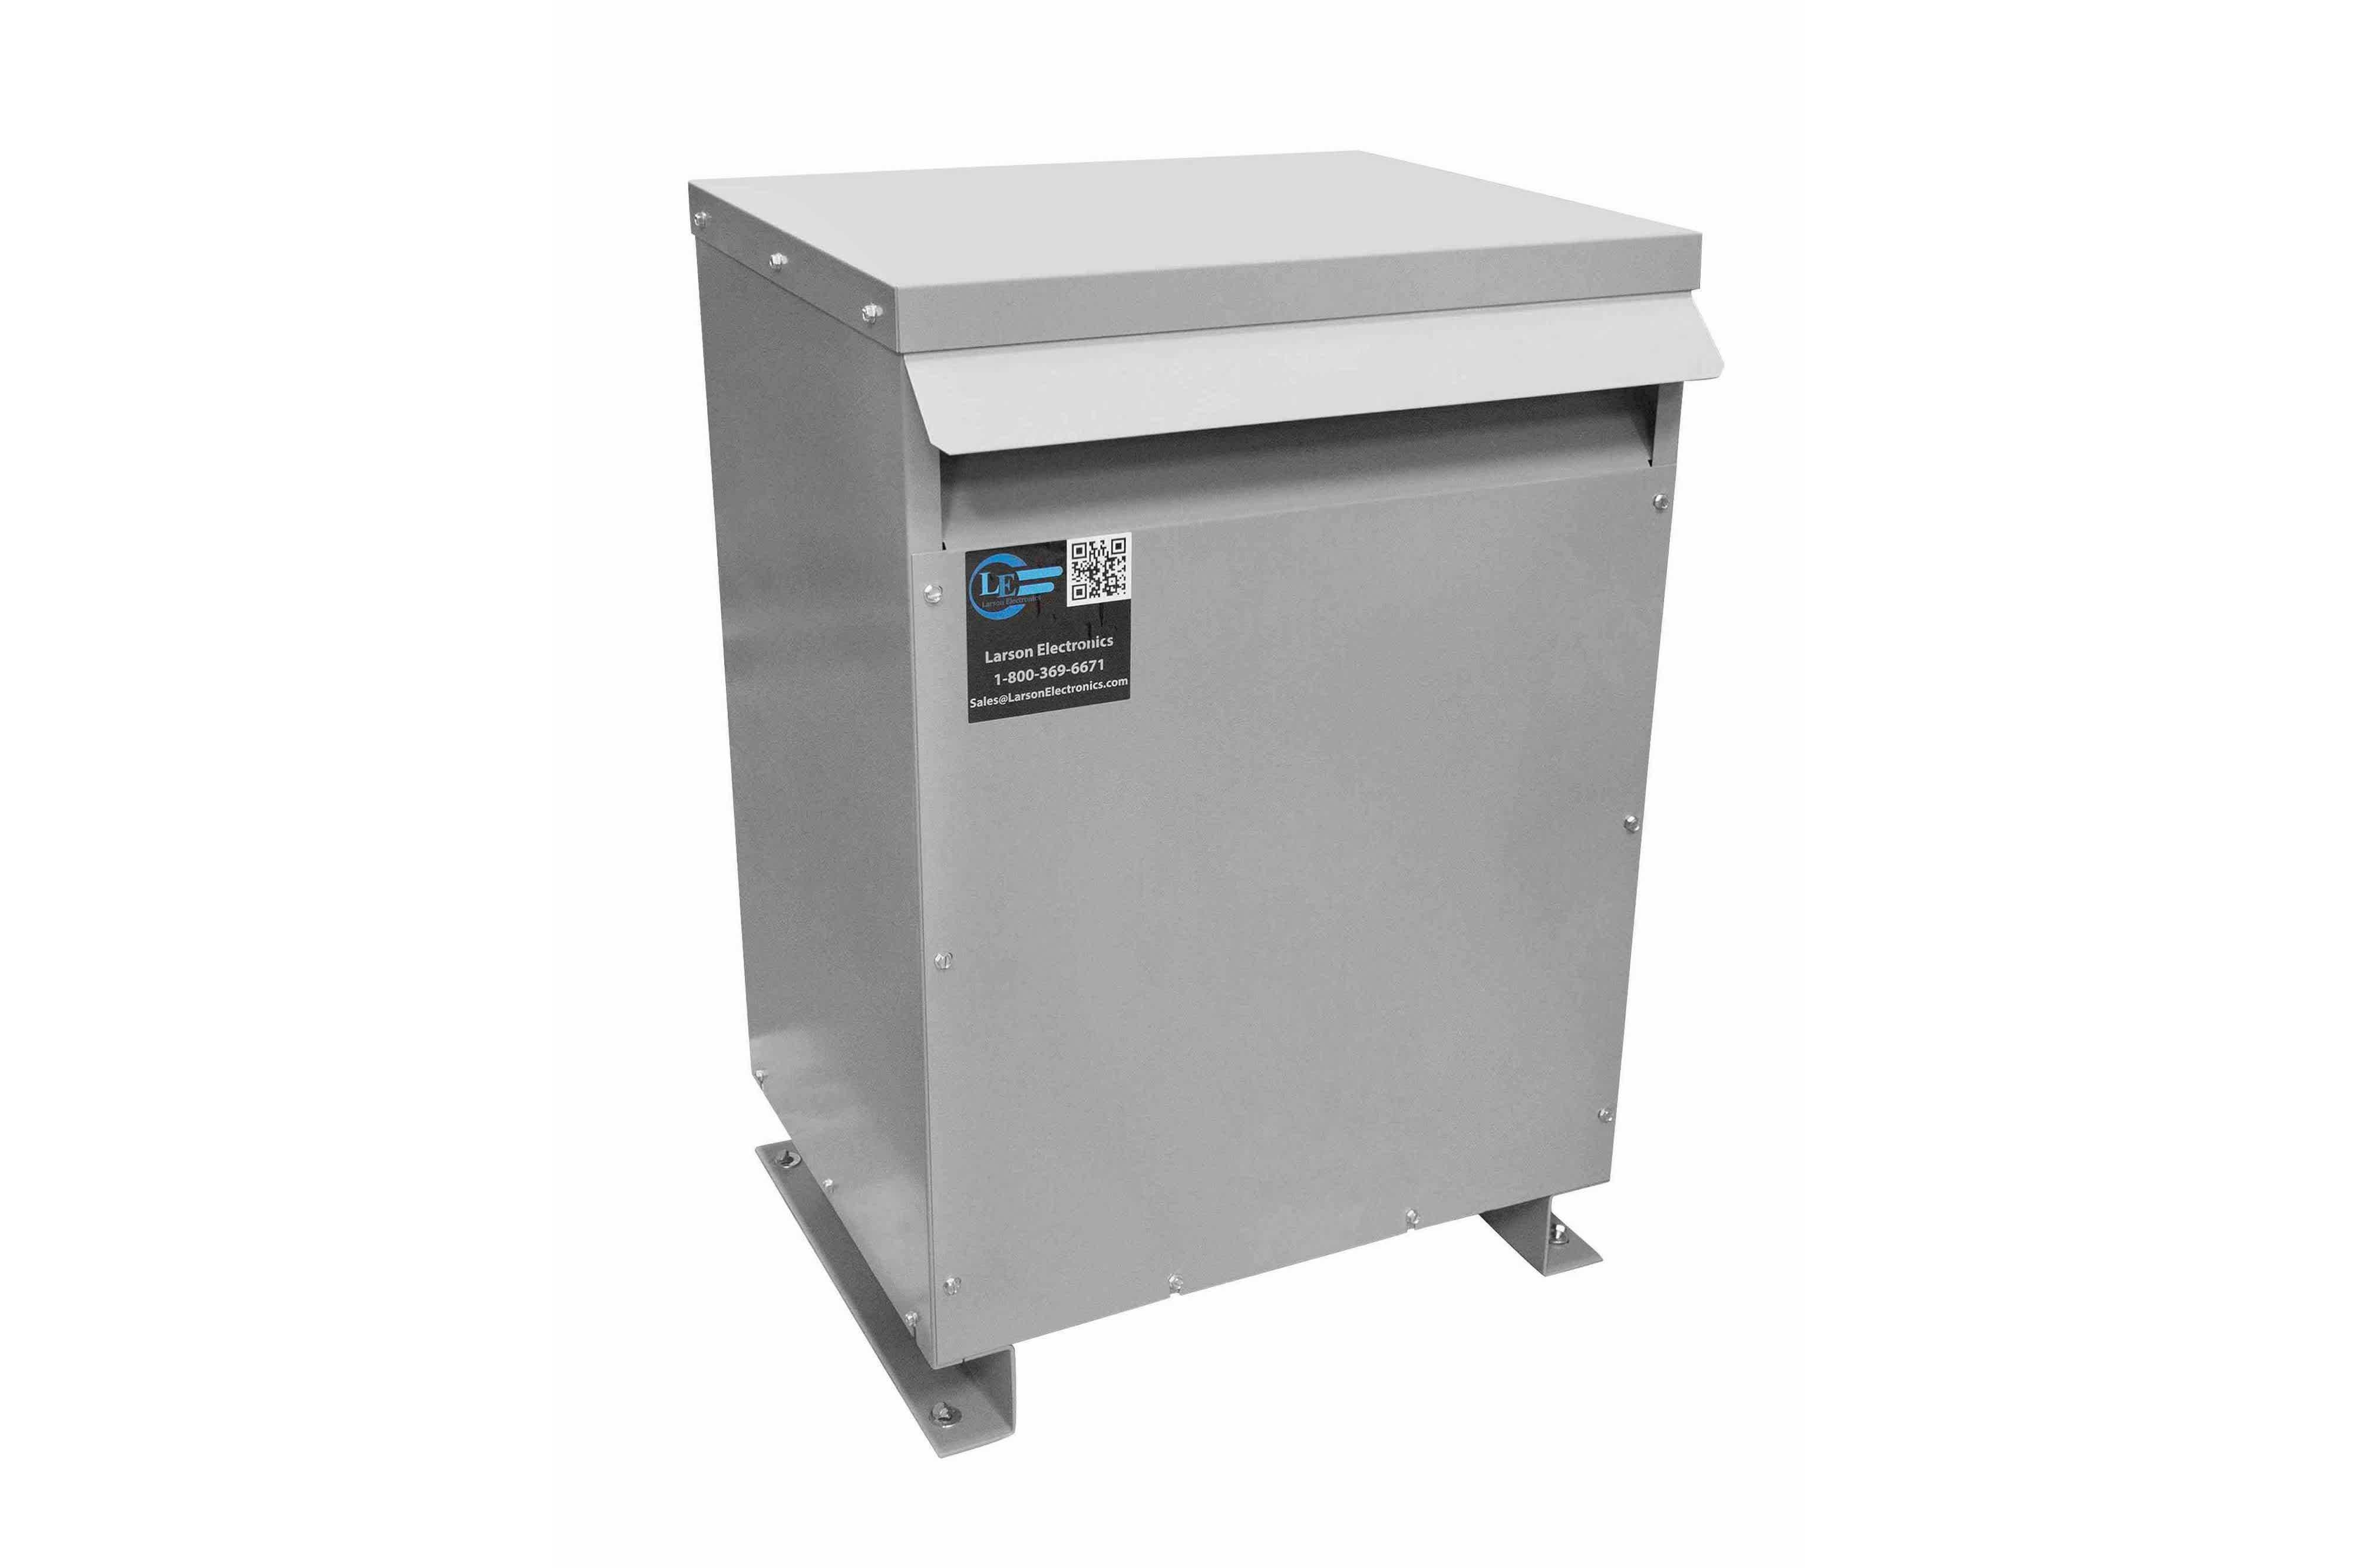 275 kVA 3PH Isolation Transformer, 460V Wye Primary, 380Y/220 Wye-N Secondary, N3R, Ventilated, 60 Hz